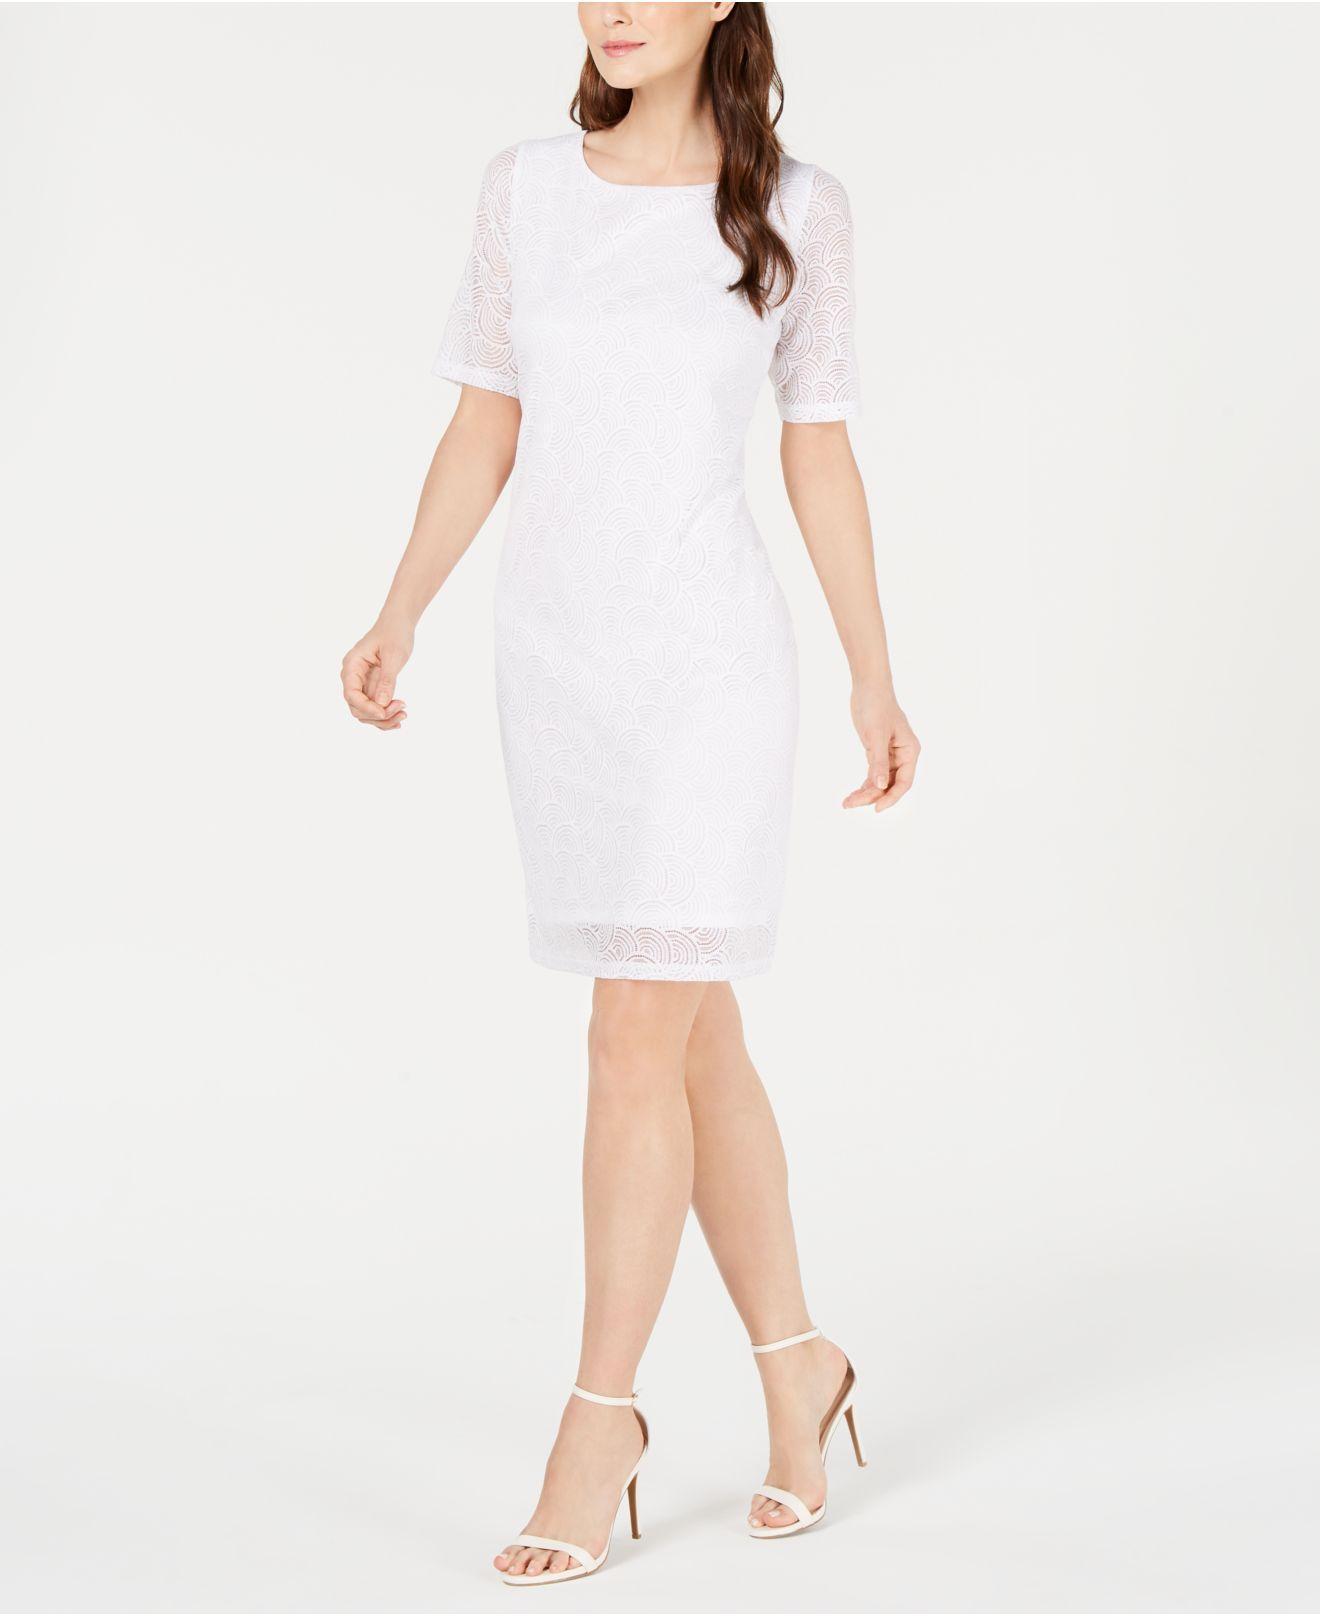 33e05598703 White Formal Dresses Macys - Gomes Weine AG